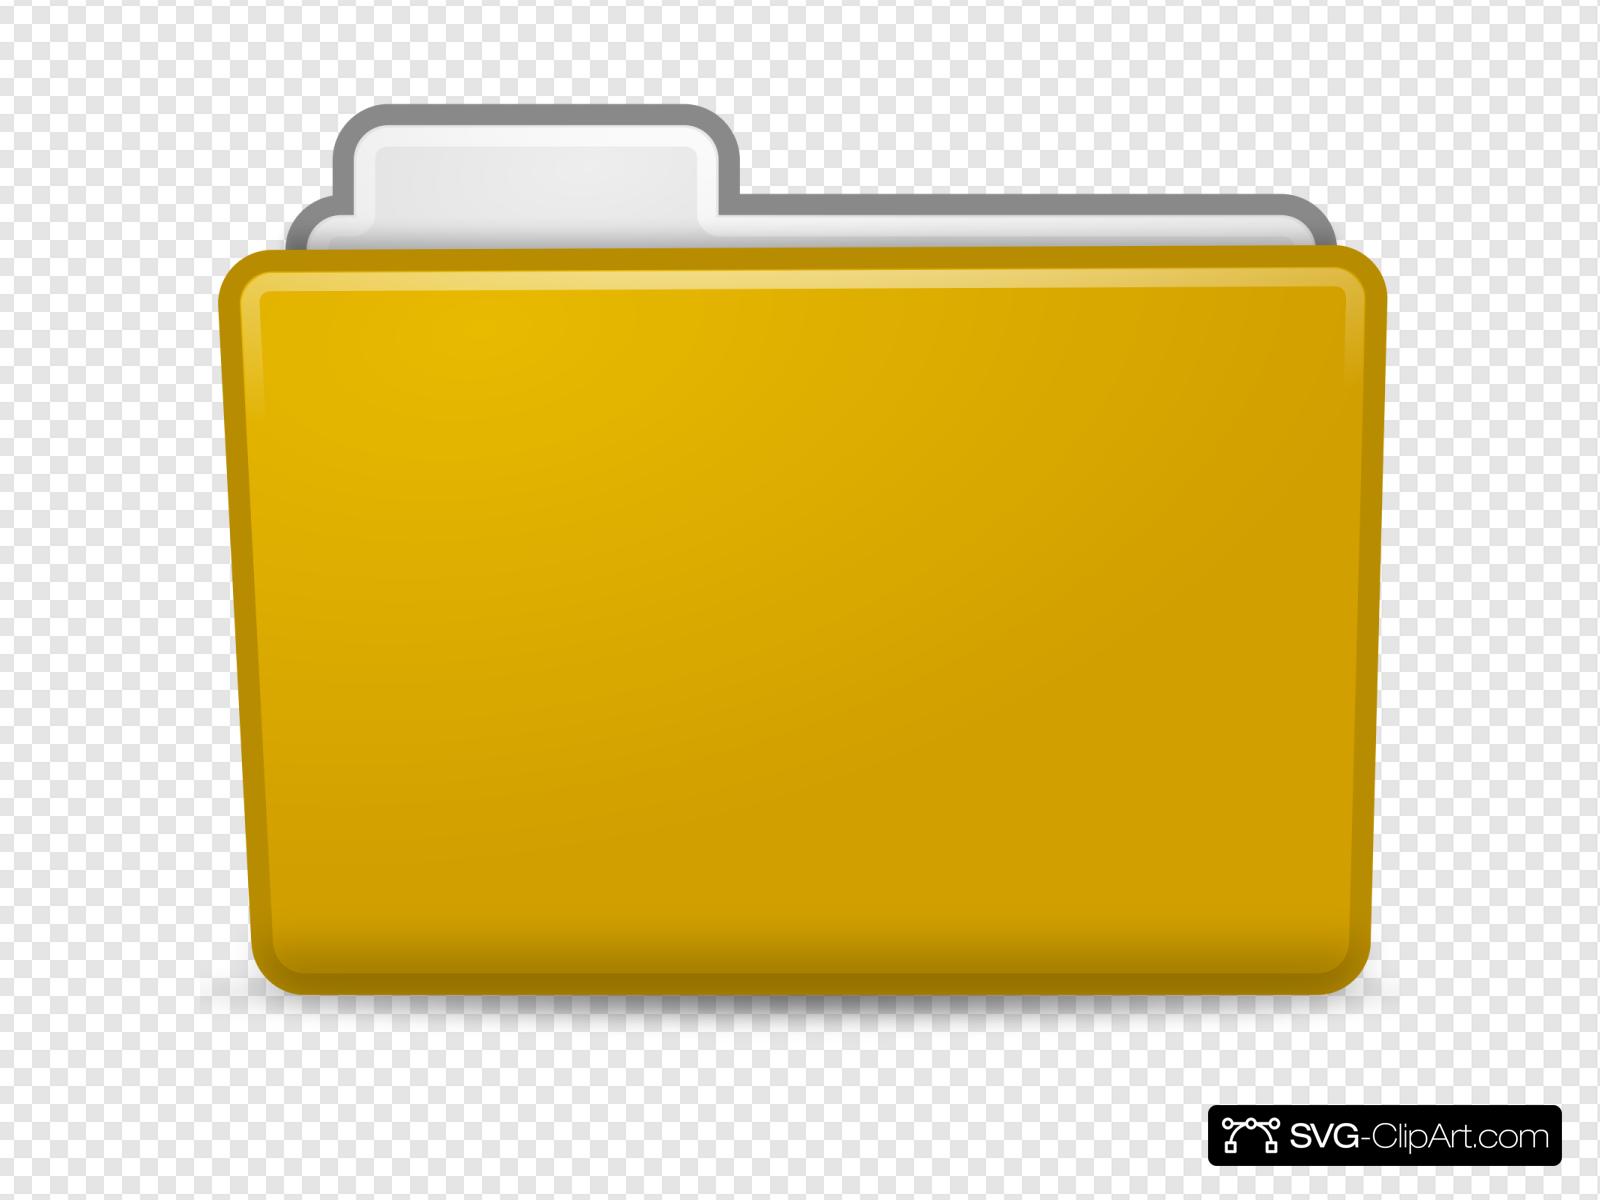 Yellow folder clipart jpg freeuse Yellow Folder Clip art, Icon and SVG - SVG Clipart jpg freeuse